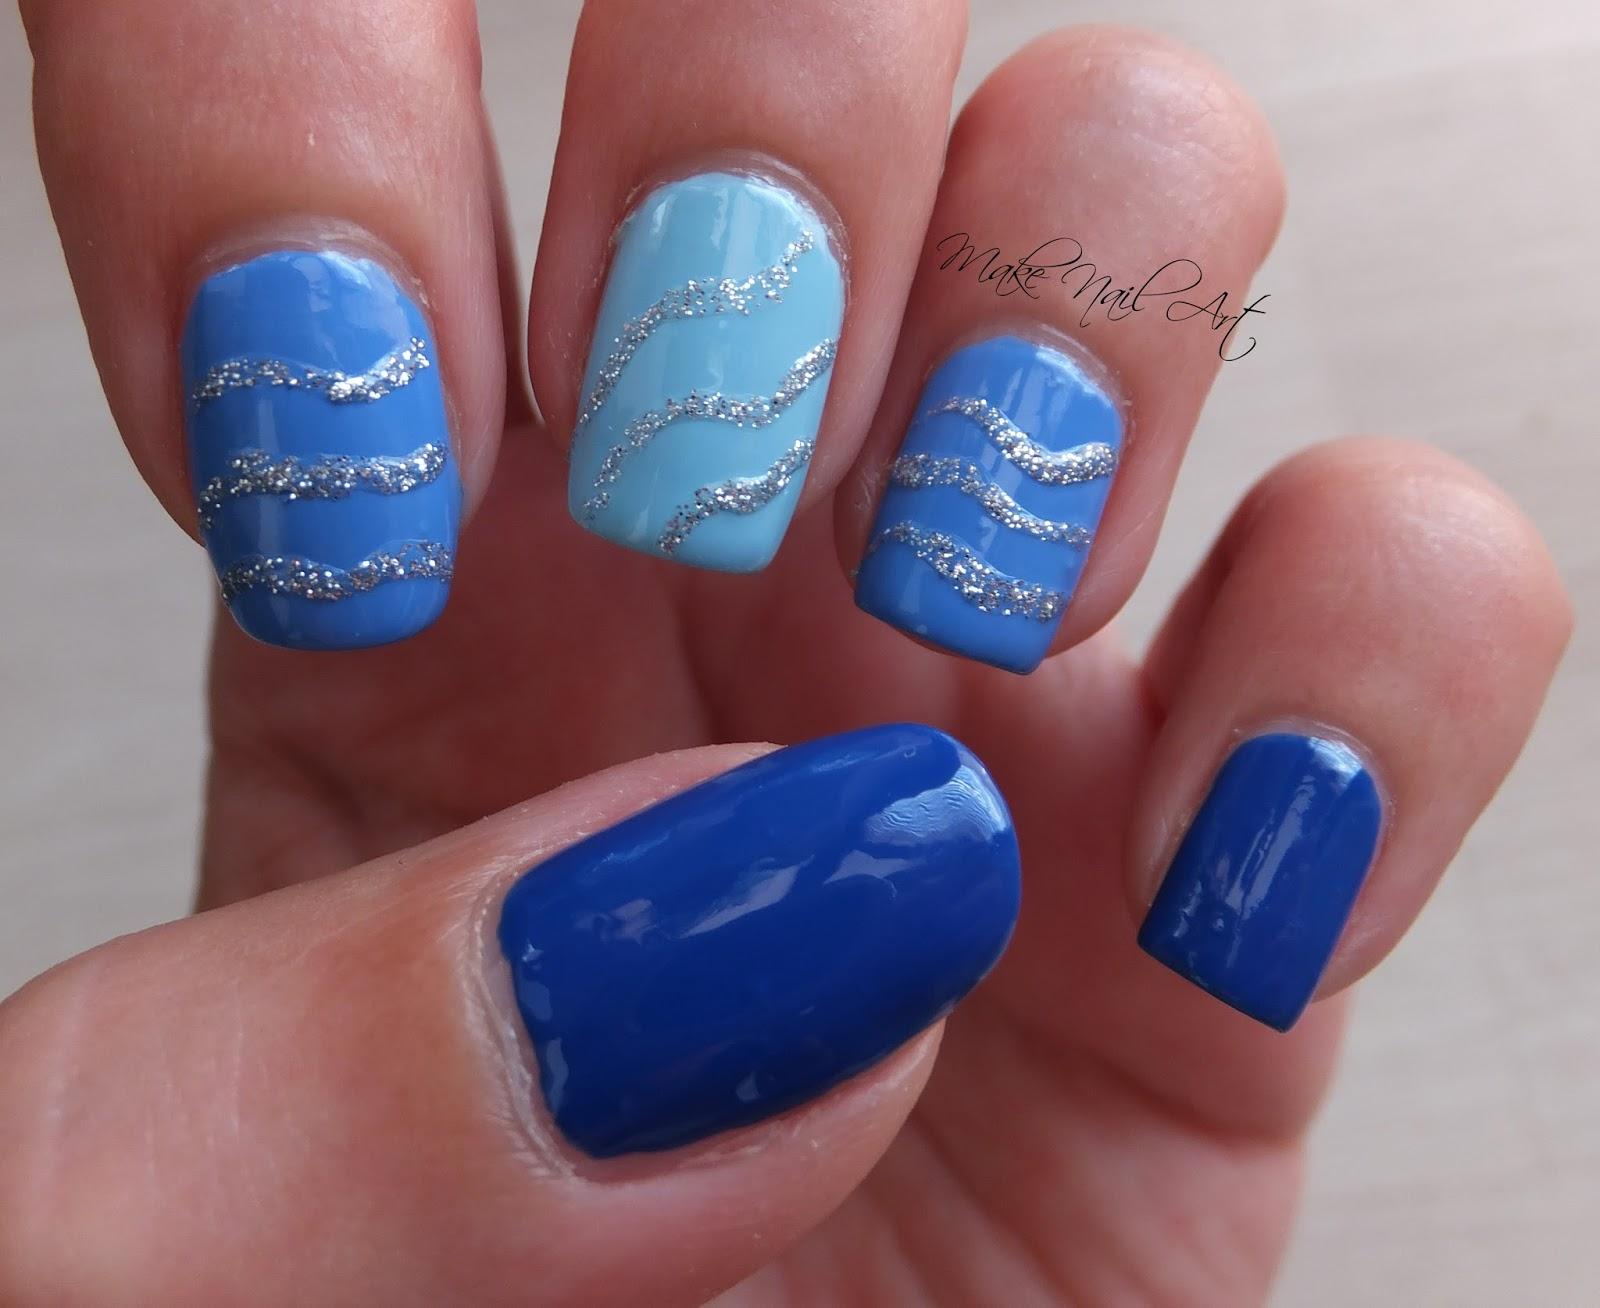 Make Nail Art: Blue And Silver Glitter Nail Art Design Tutorial